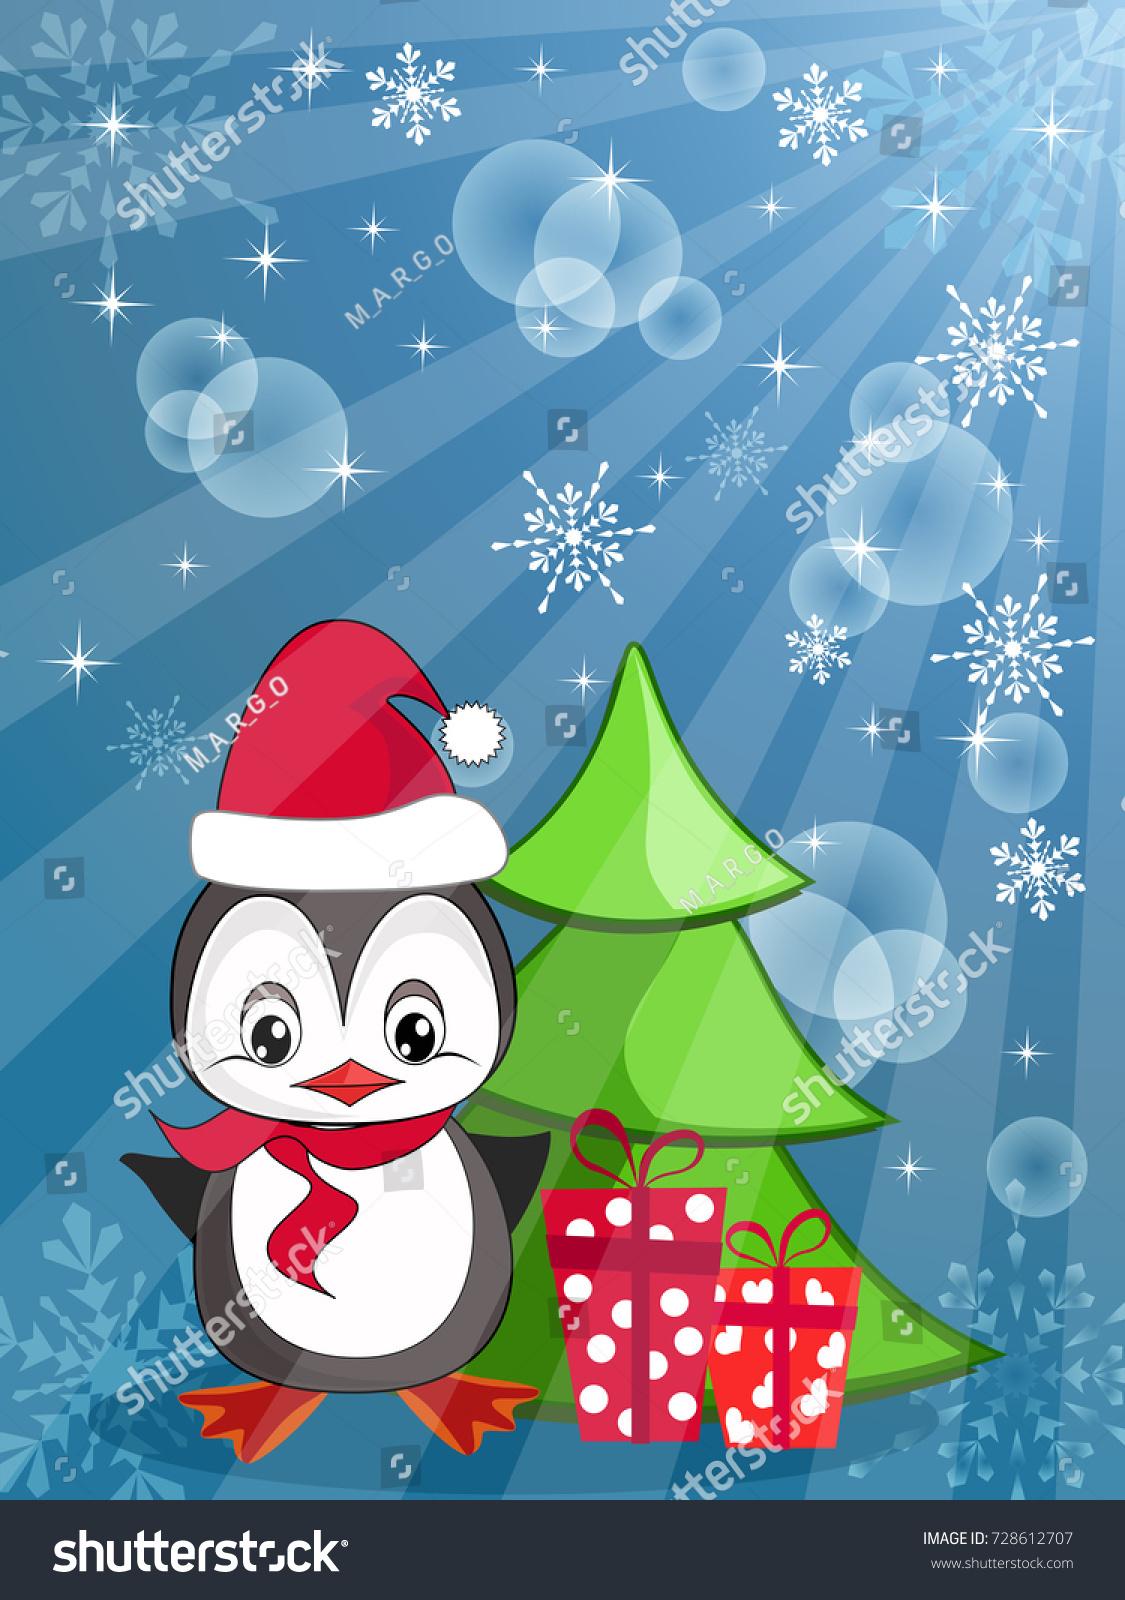 Baby Gift Vector : Cute cartoon baby penguin gifts christmas stock vector